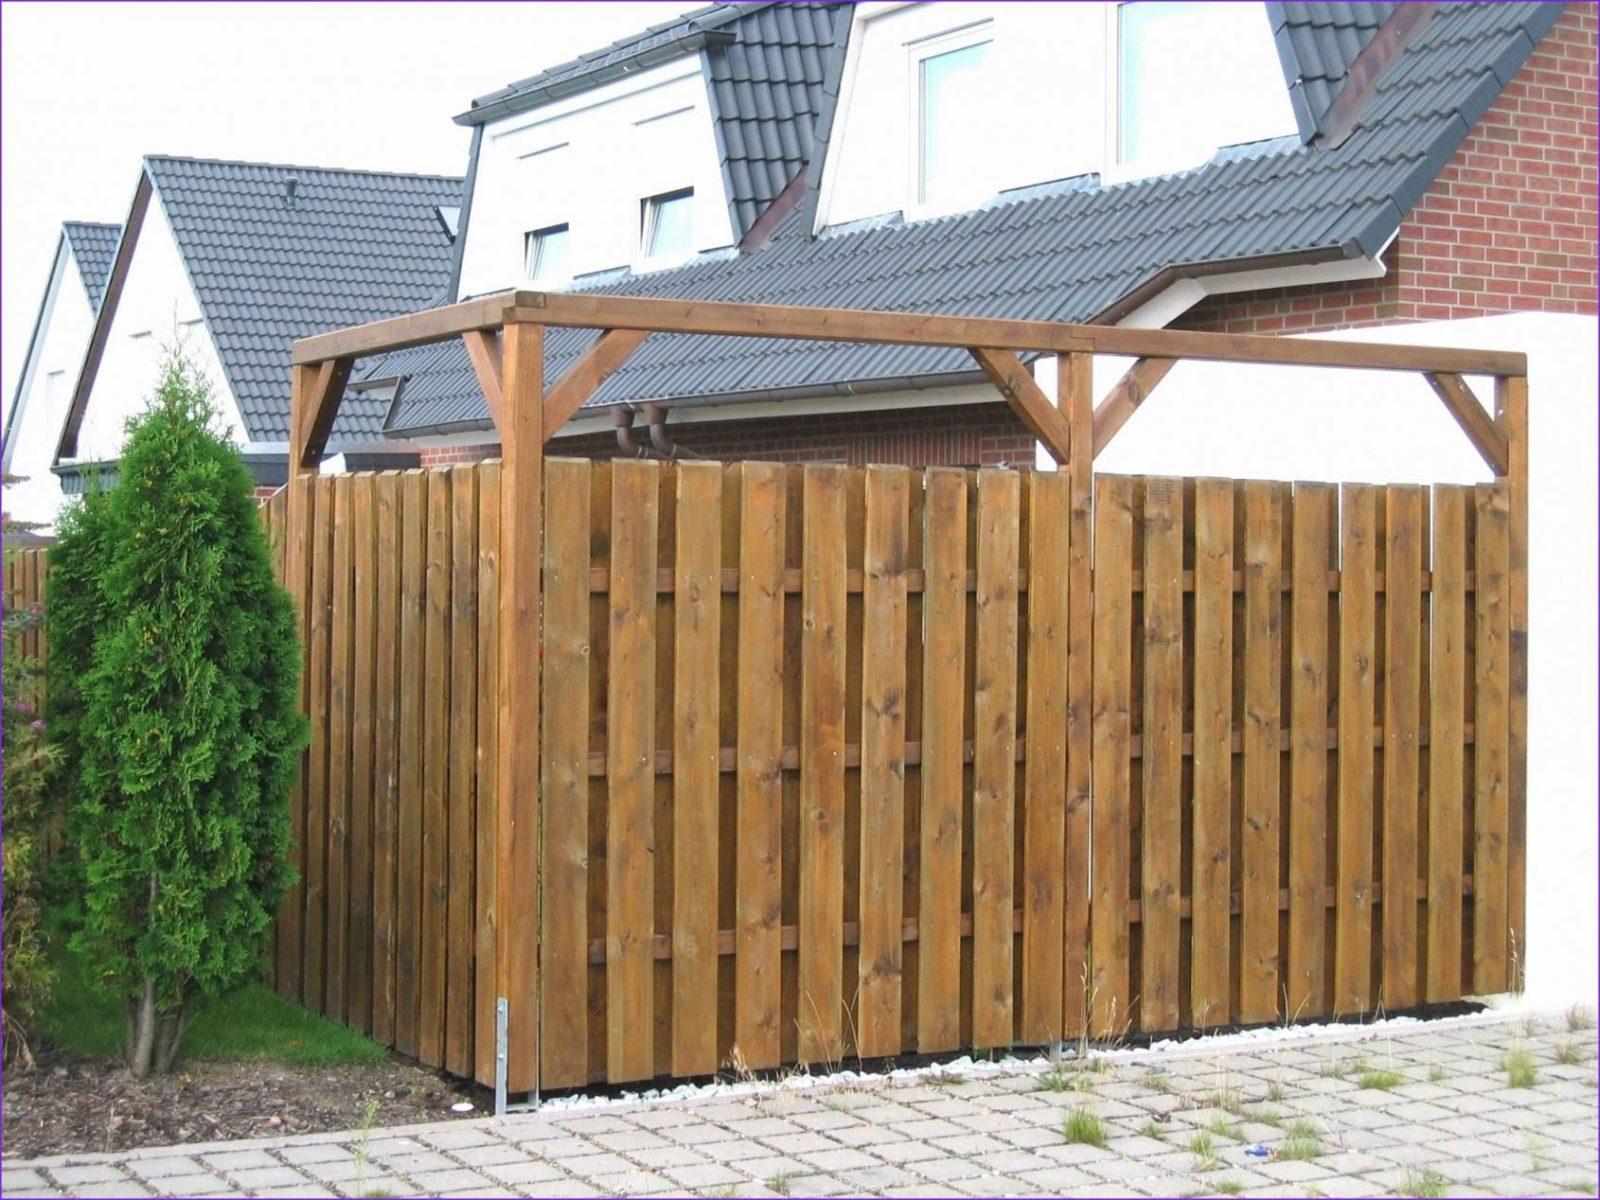 Garten Holzzaun Einzigartig Holzzaun Selber Bauen Anleitung Fenster von Holzzaun Am Hang Bauen Bild